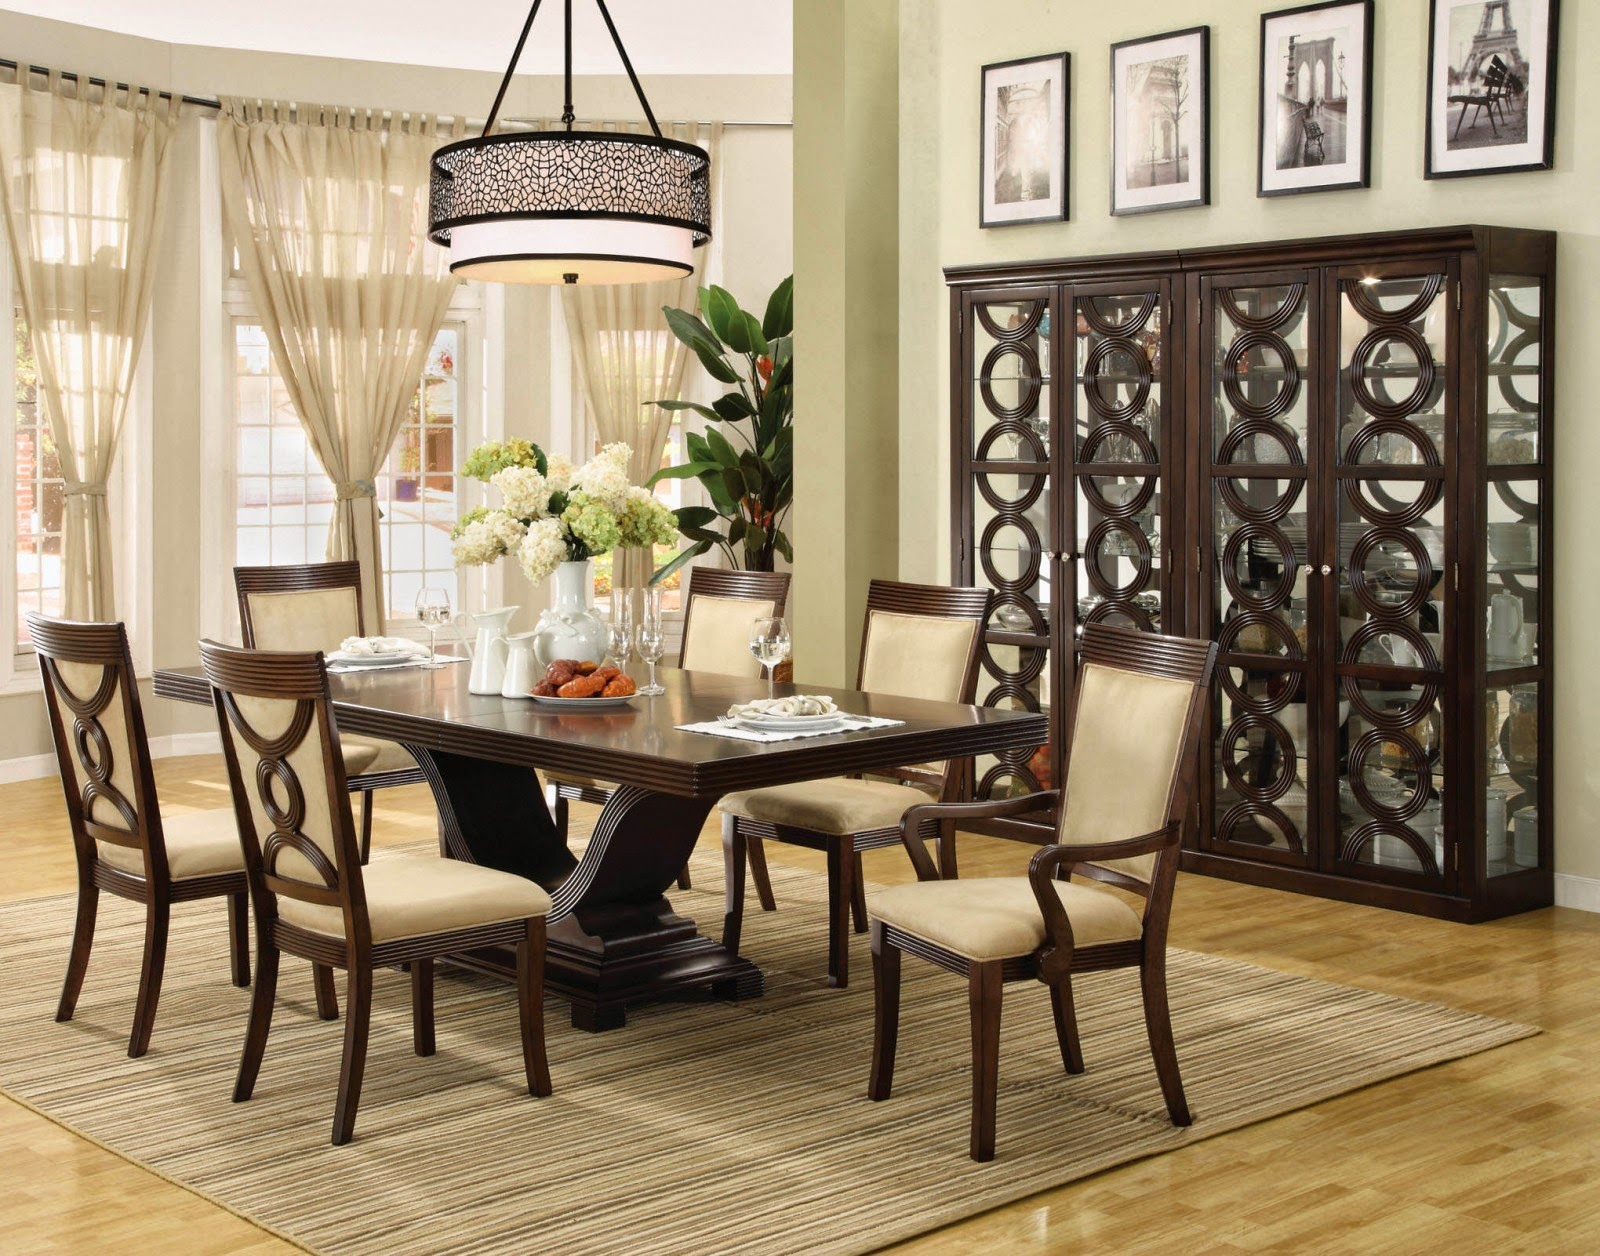 Ade Decor Dining Room Table Centerpiece Ideas